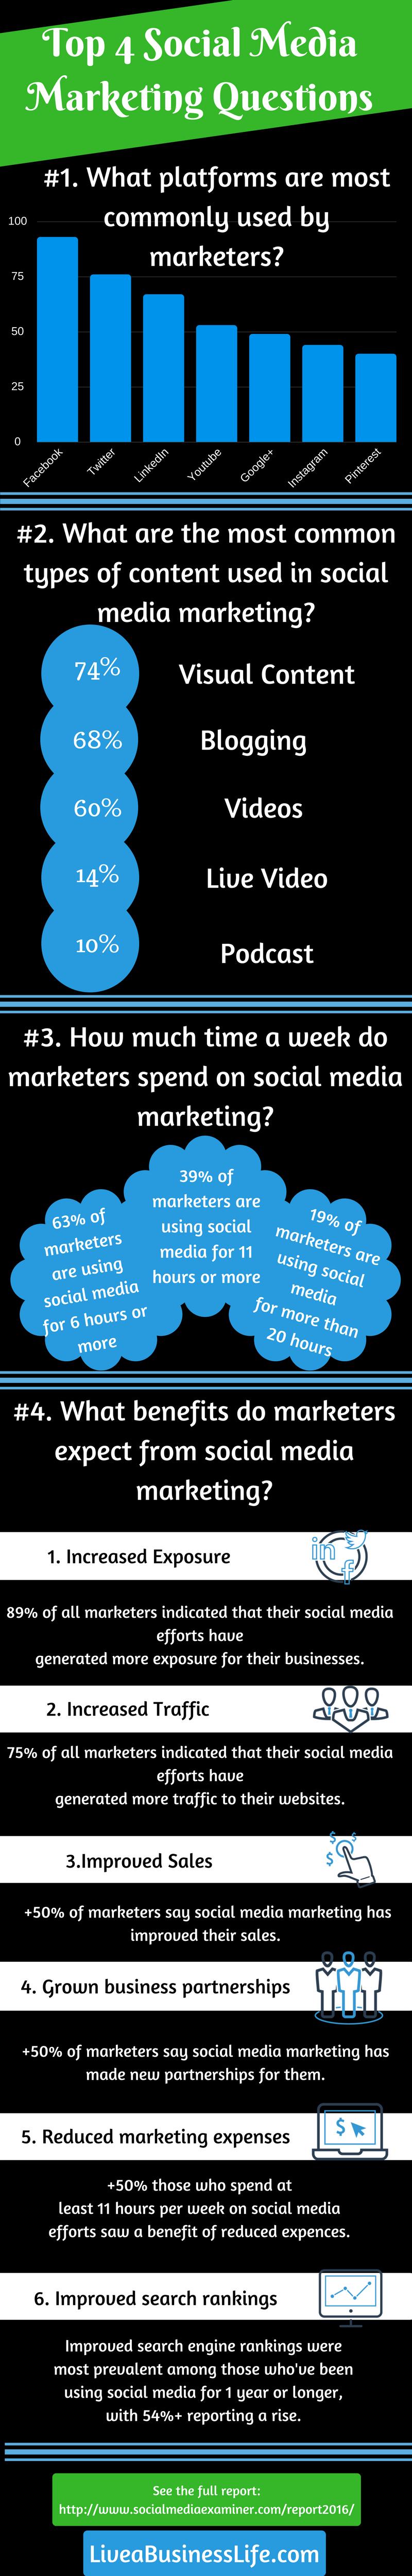 [Infographic]: Top 4 Social Media Marketing Questions -- LiveaBusinessLife.com